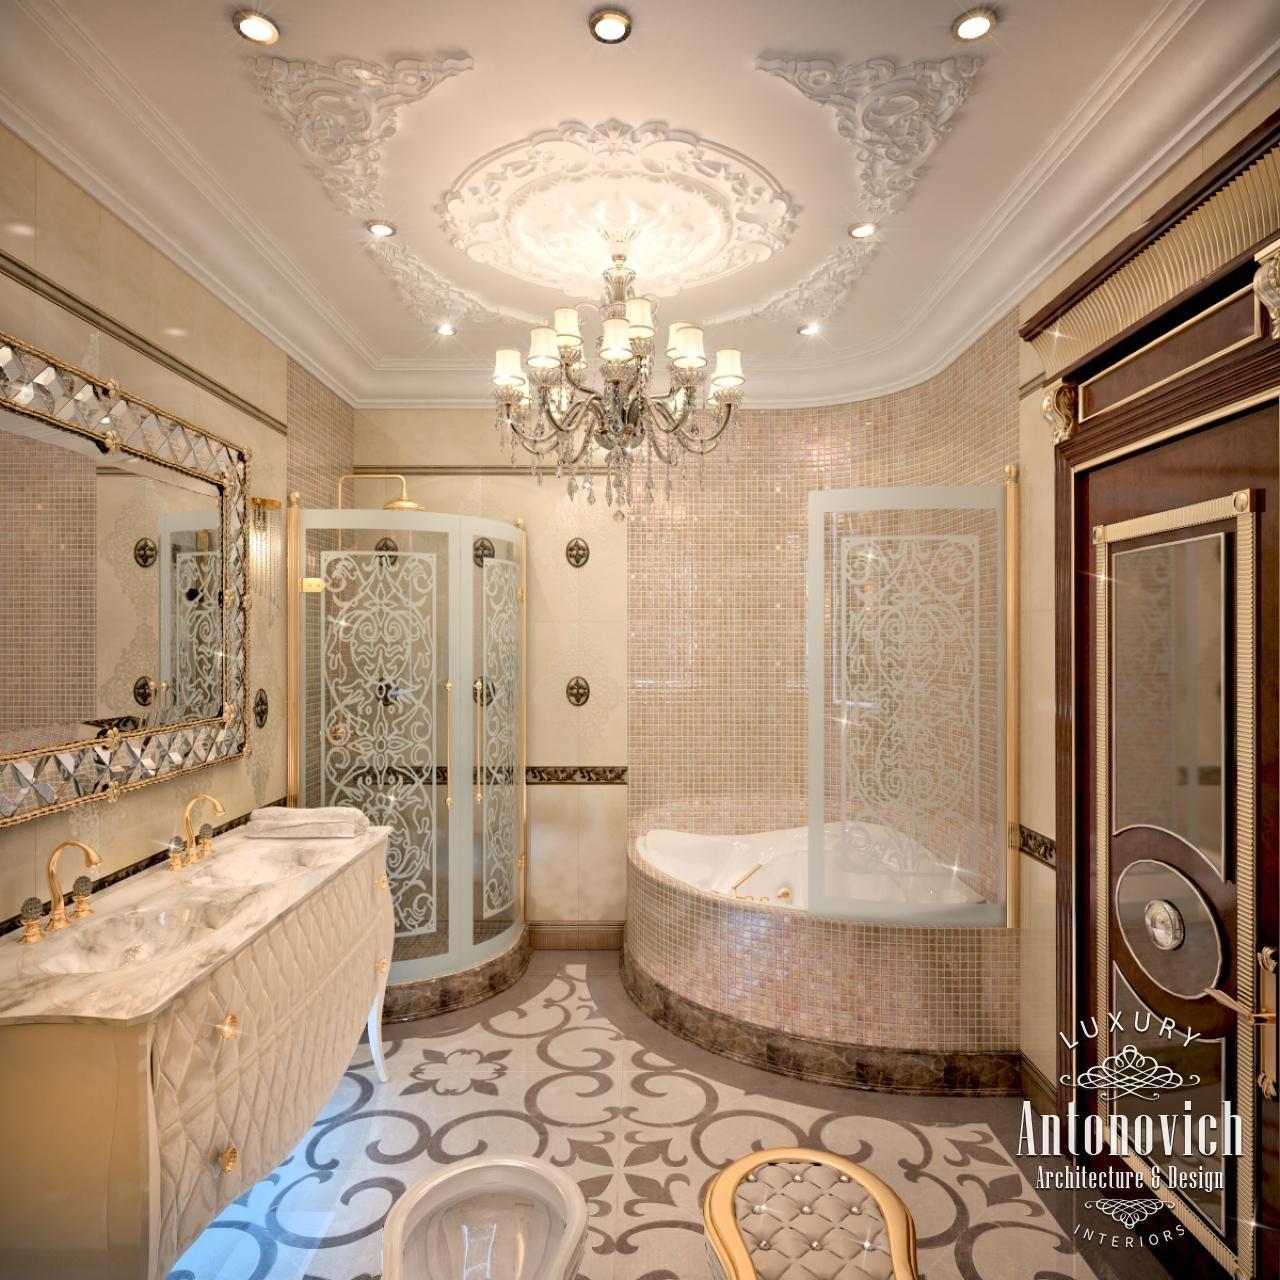 Bathroom Designs Dubai bathroom design in dubai, luxury bathroom interior, photo 3 | wash